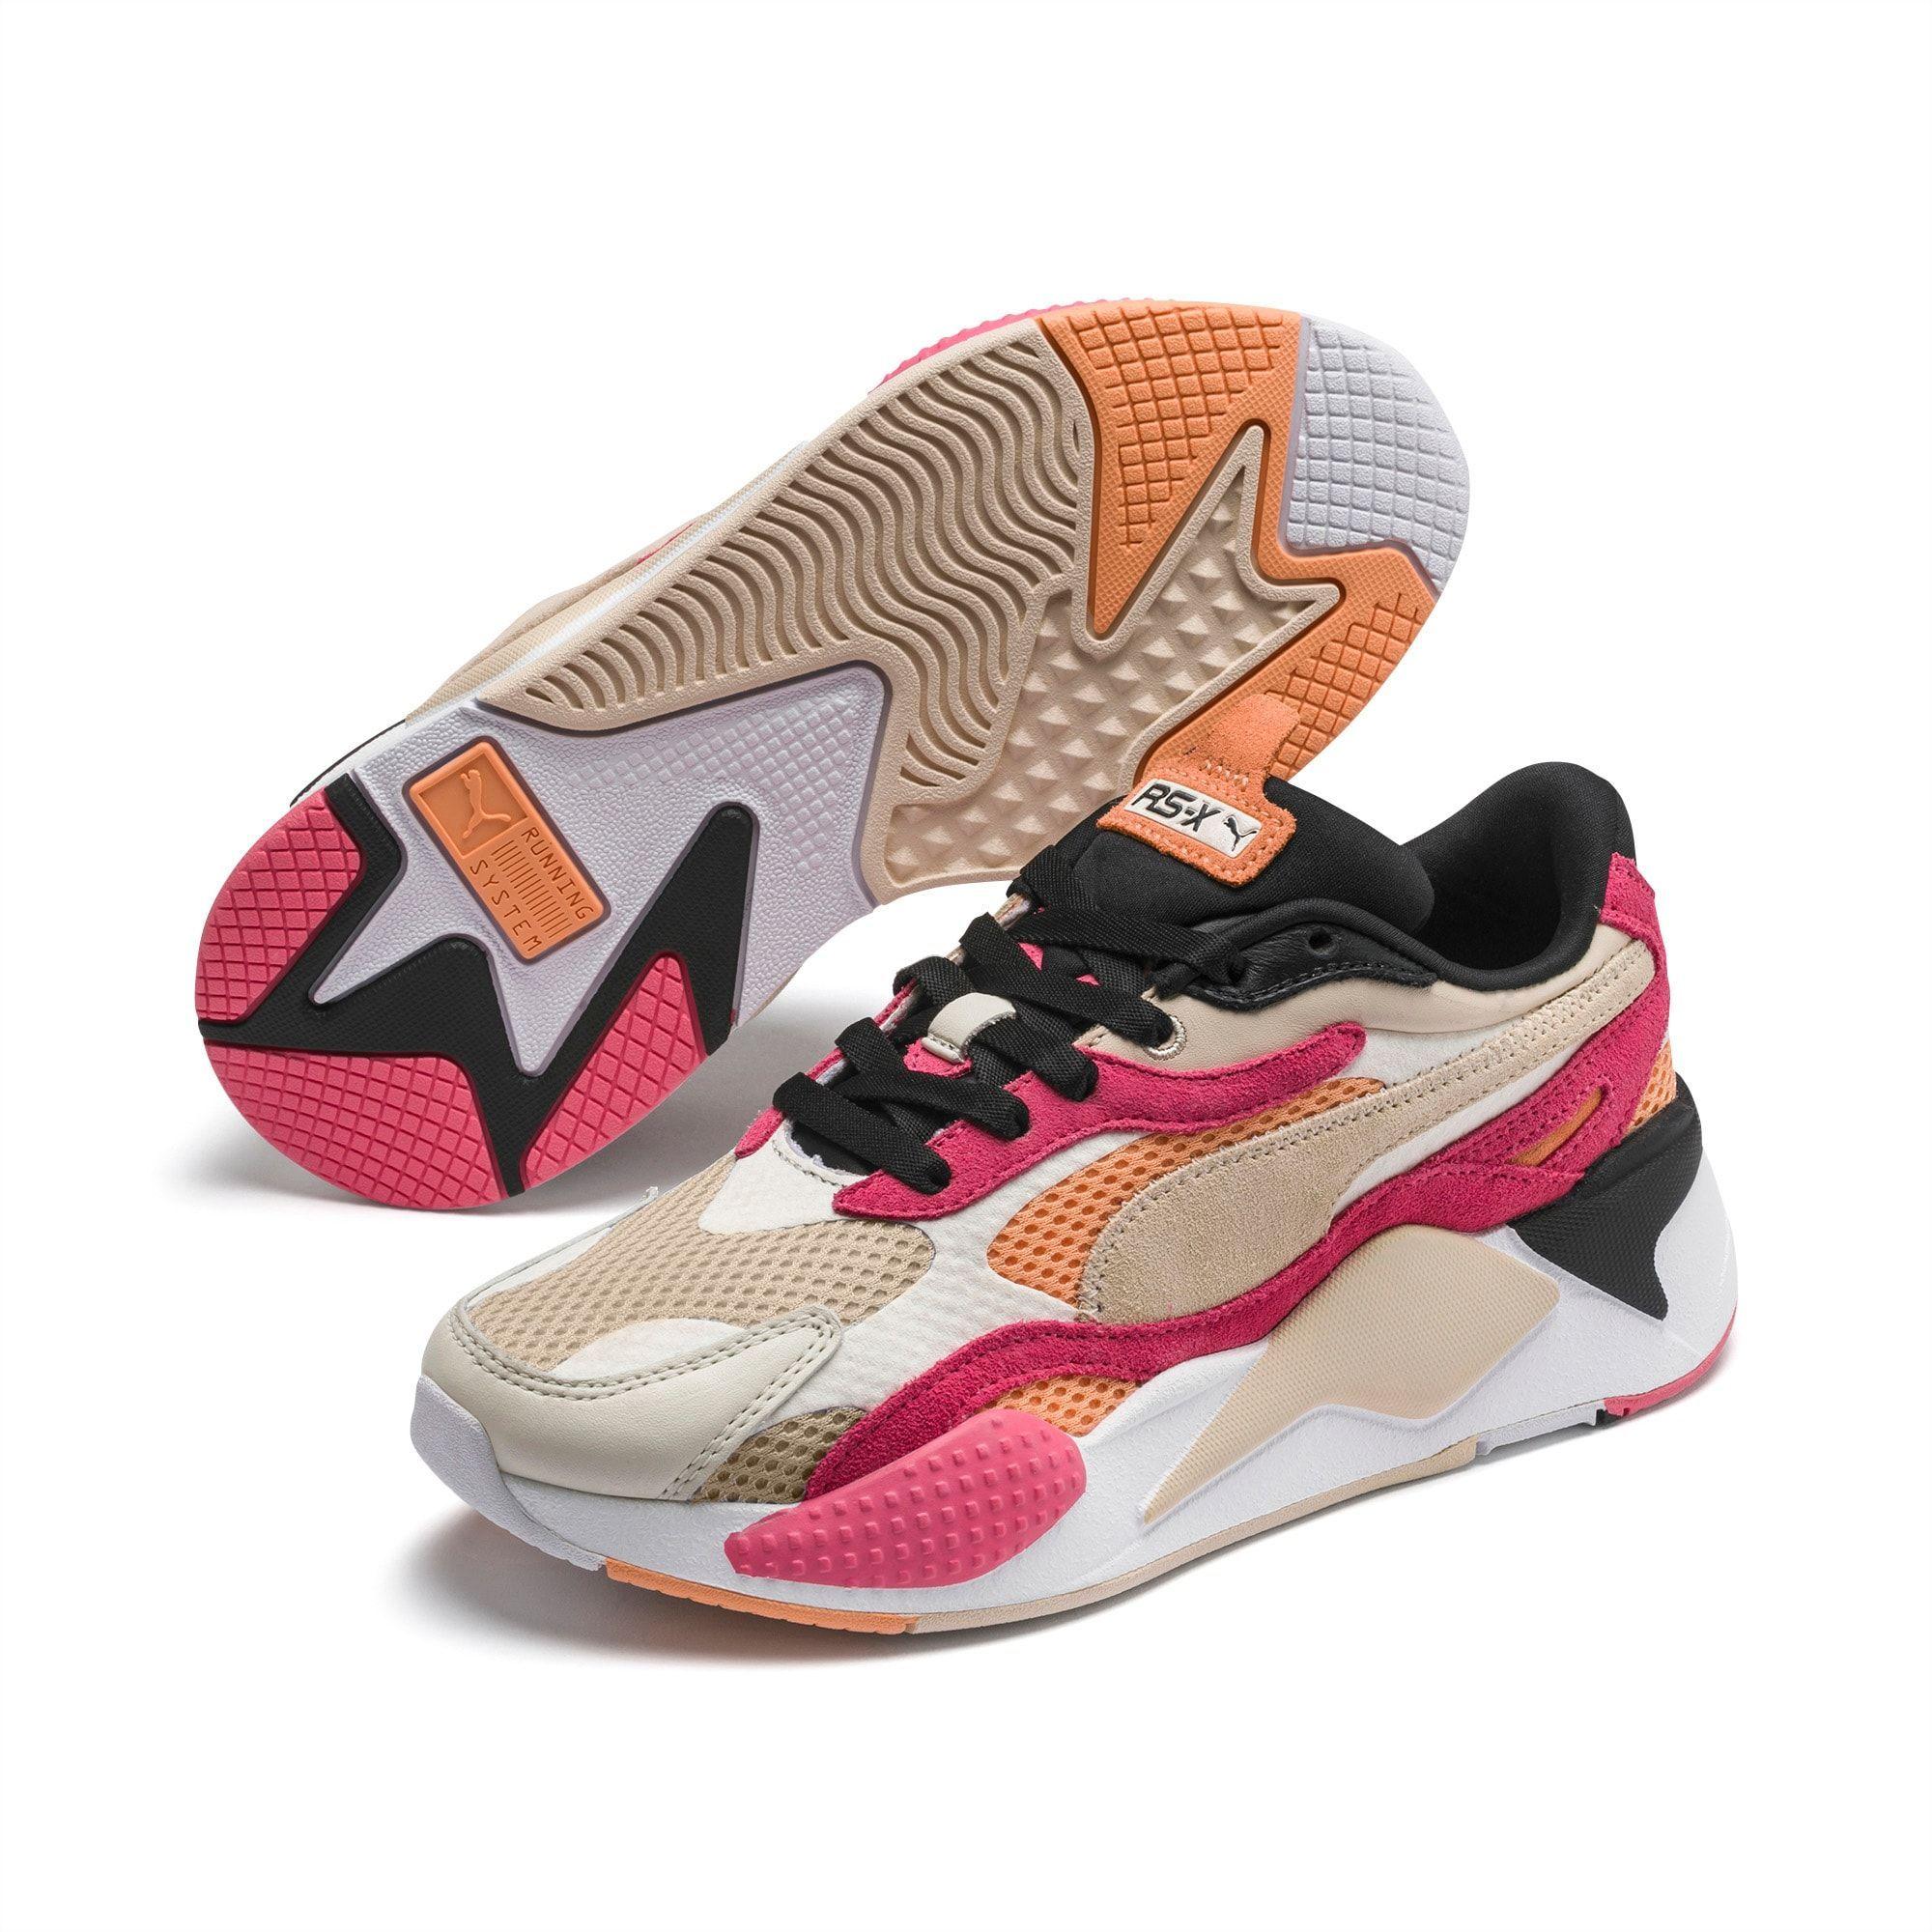 PUMA Rs-X3 Mesh Pop Women's Trainers, Marshmallow/Bubblegum, size ...